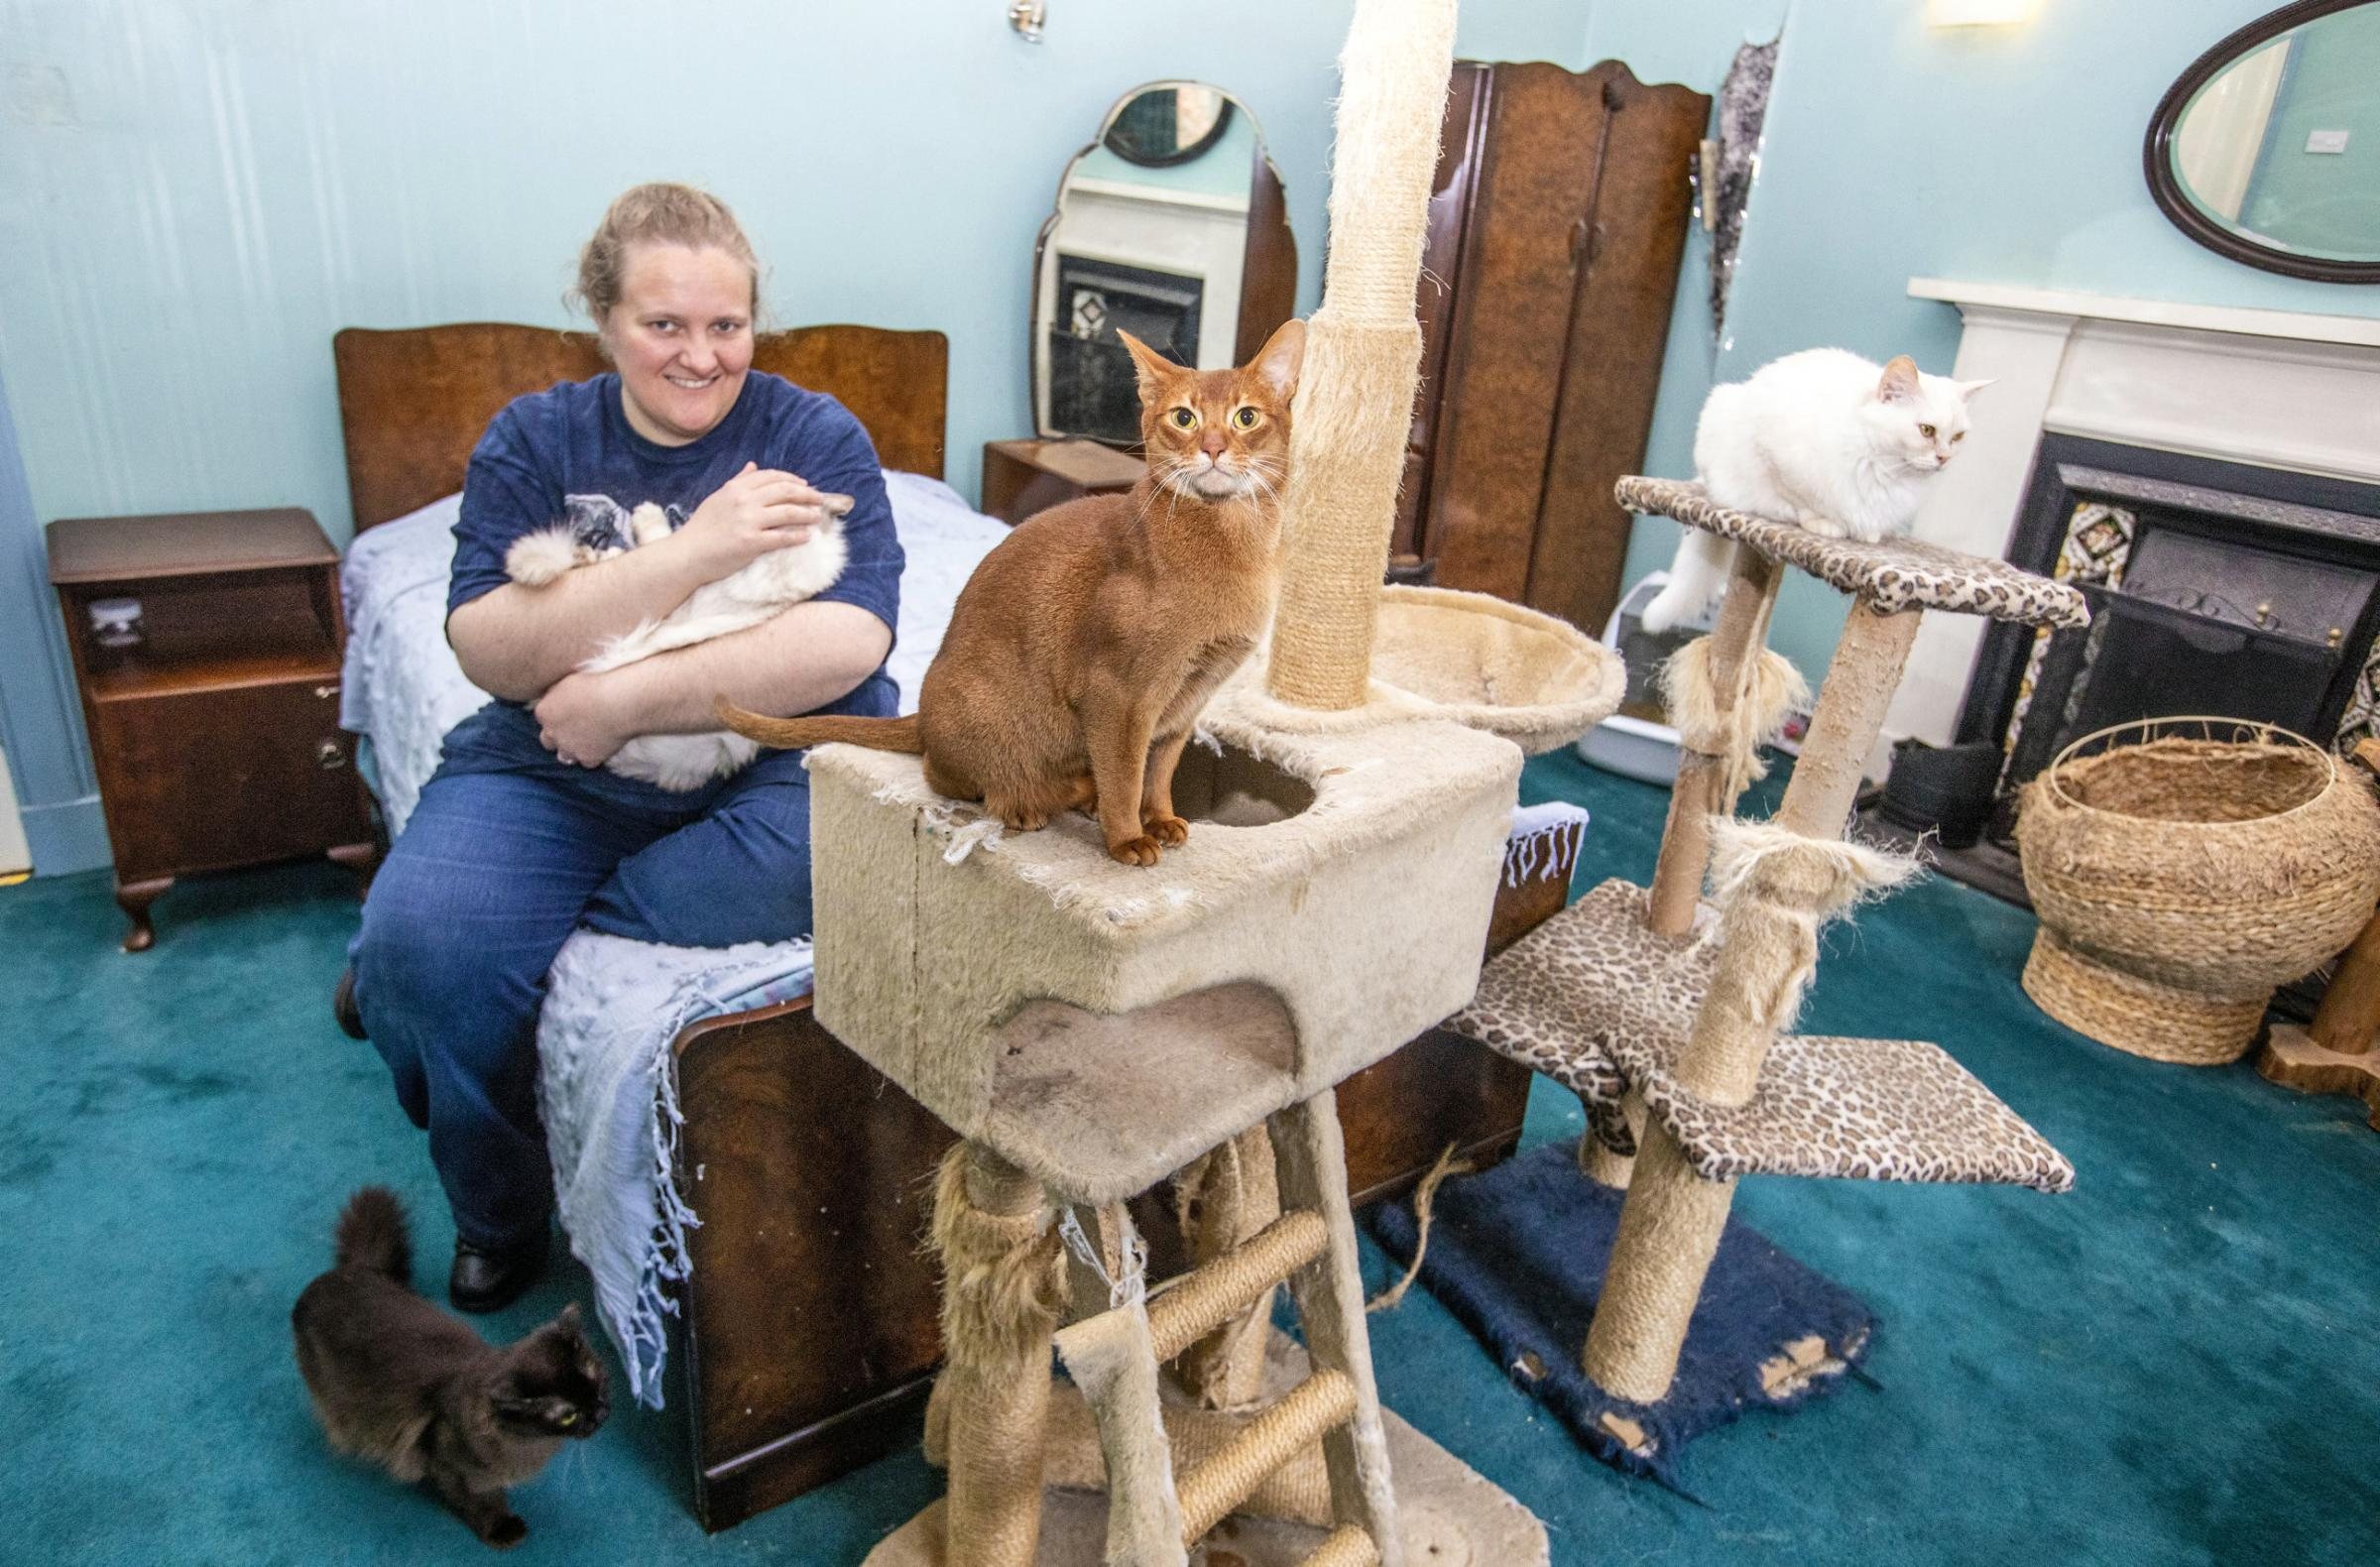 Dedication to rare cats takes breeder around the world